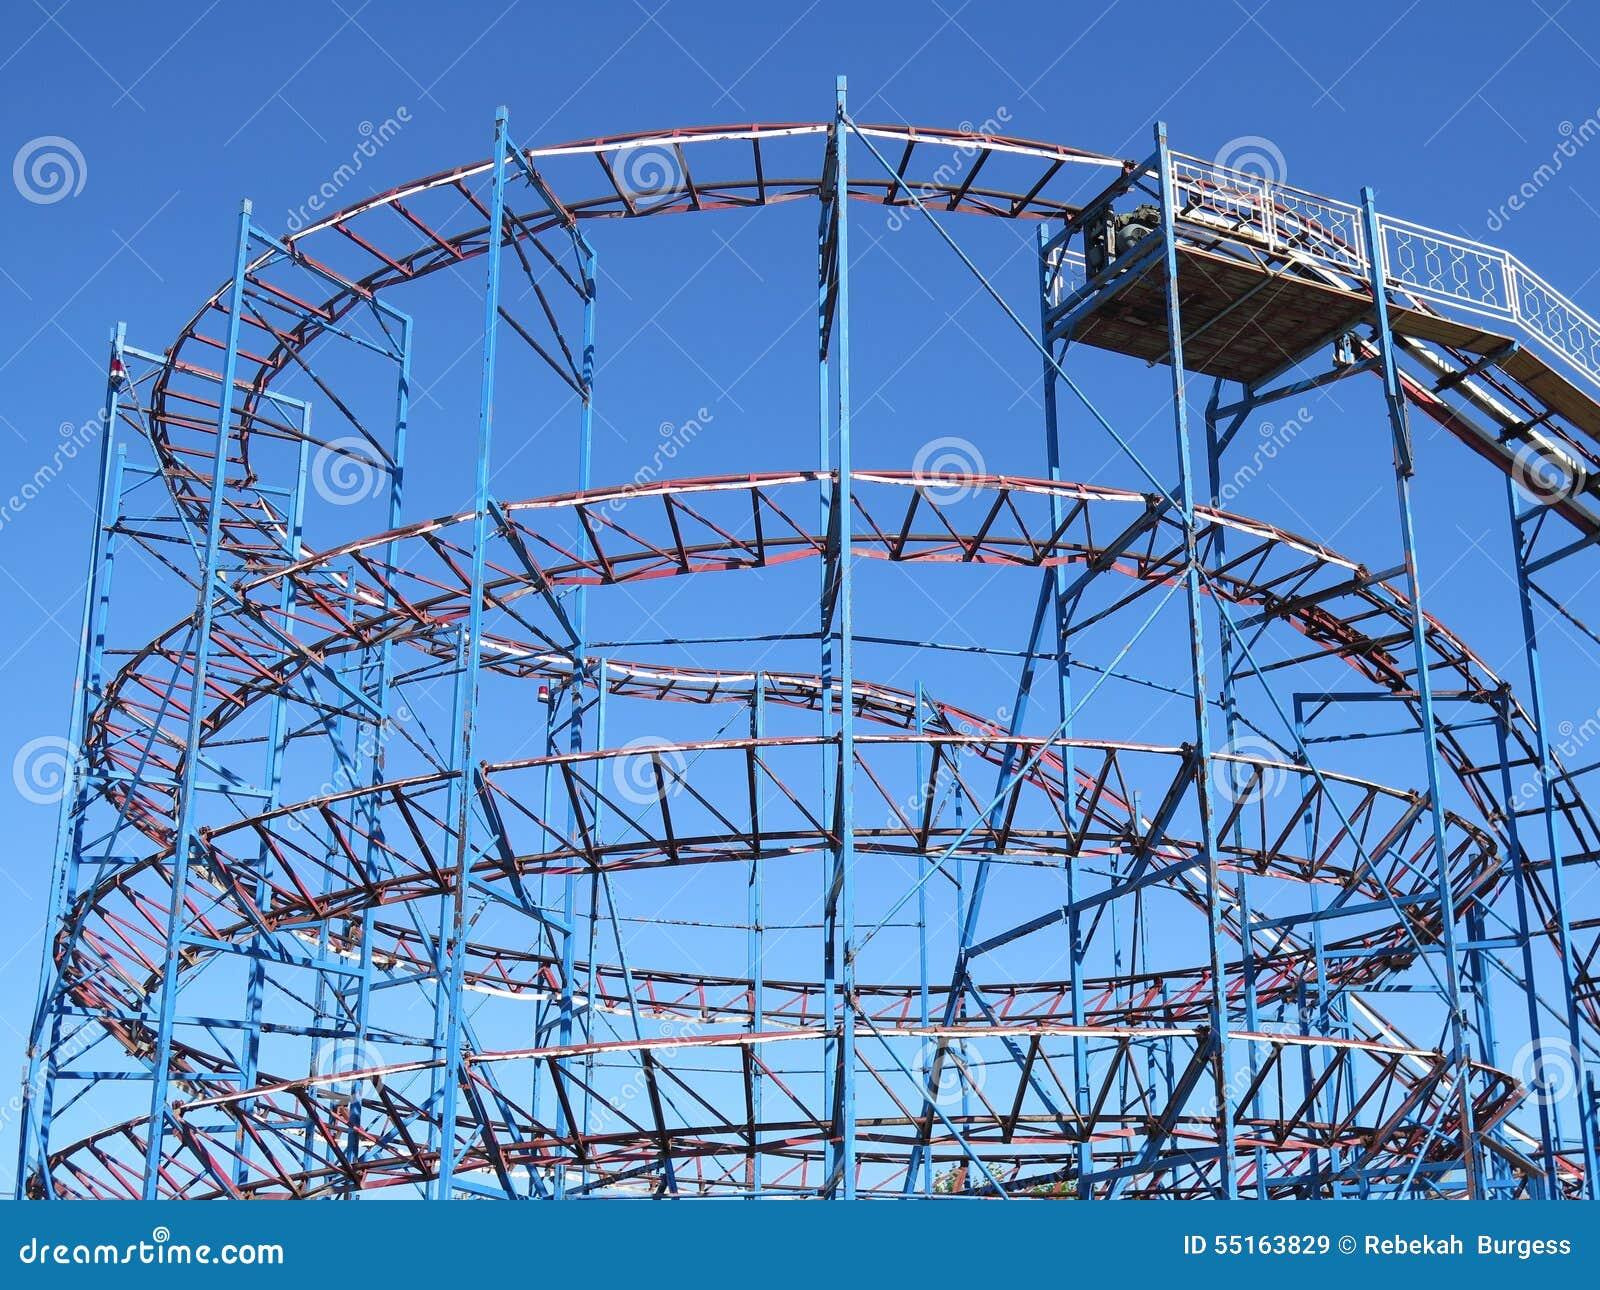 Vintage Backyard Roller Coaster : Roller Coaster Stock Photo  Image 55163829